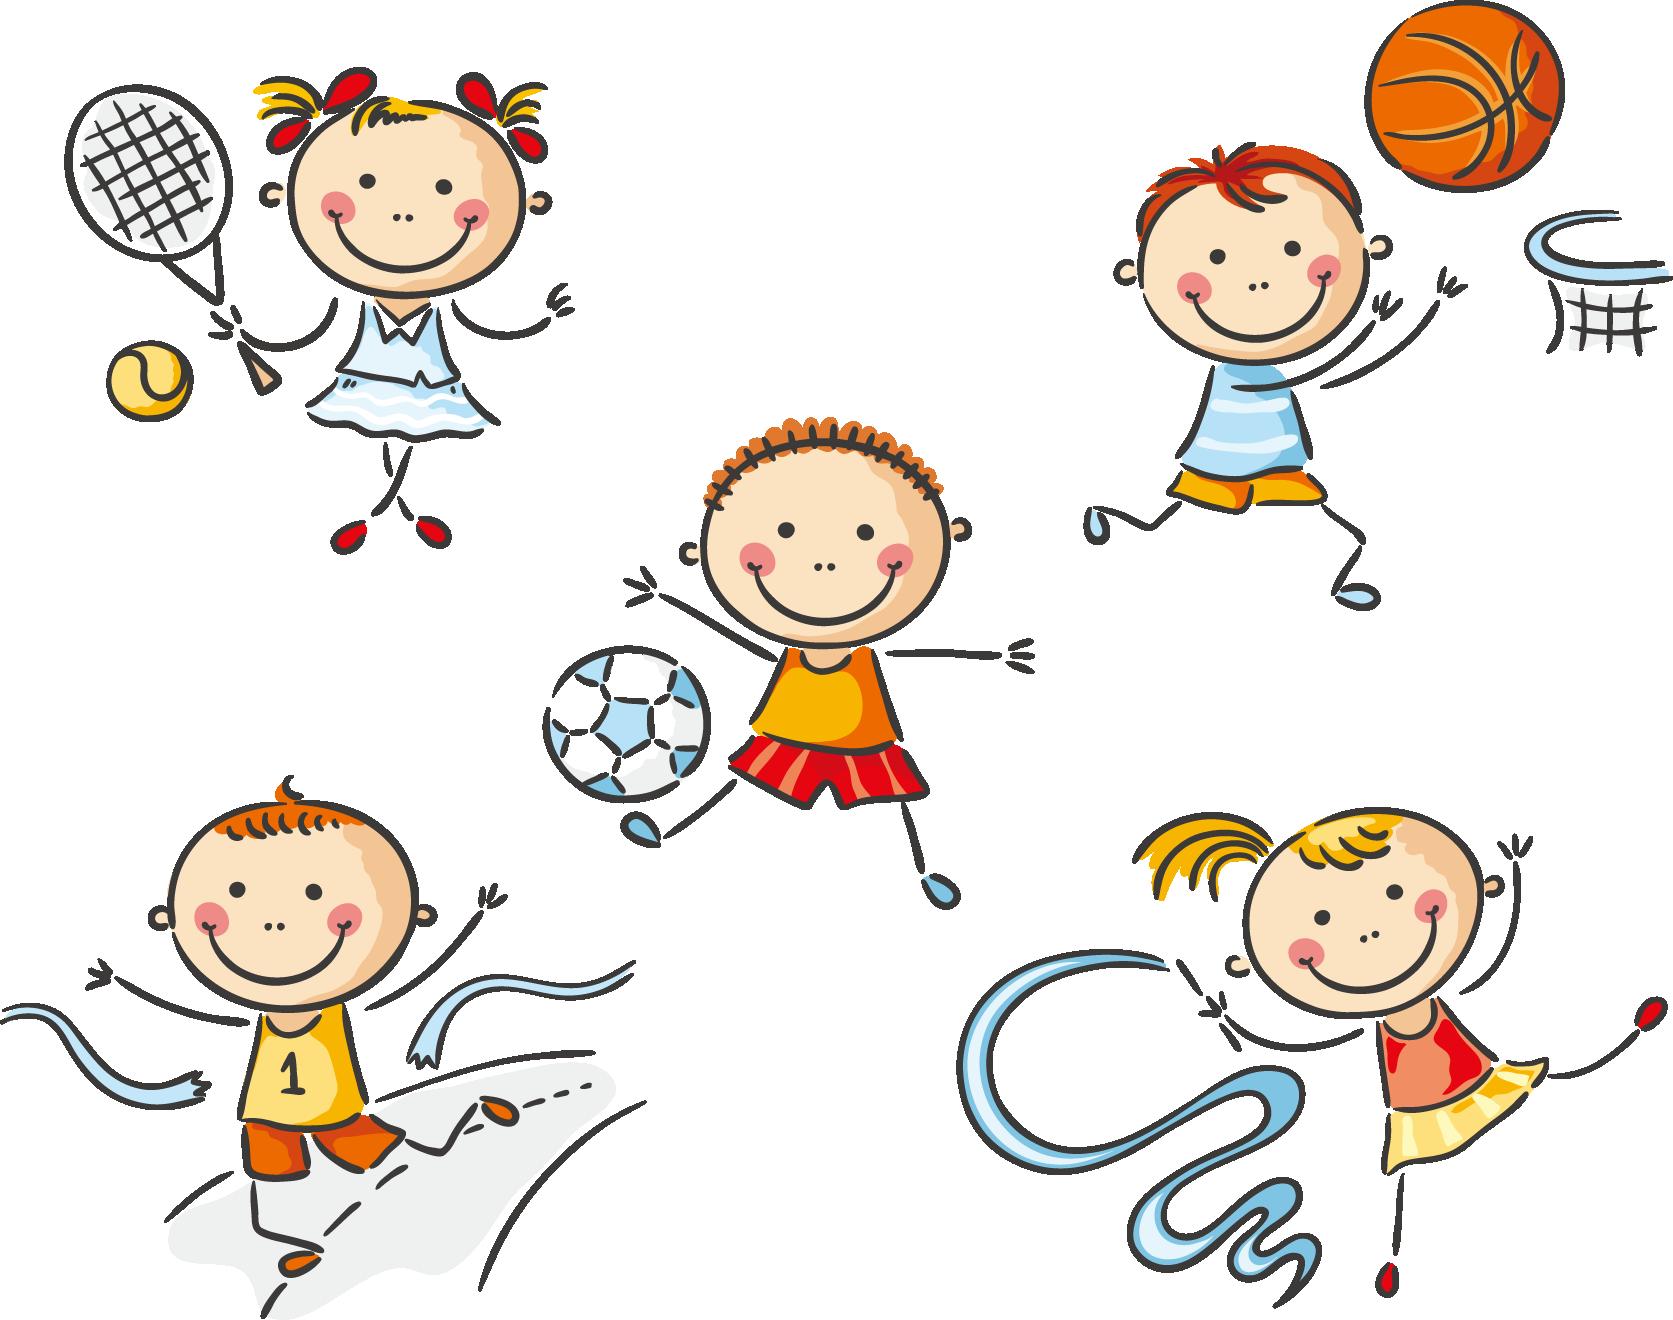 Emotions clipart clip art kid. Physical education cute cartoon